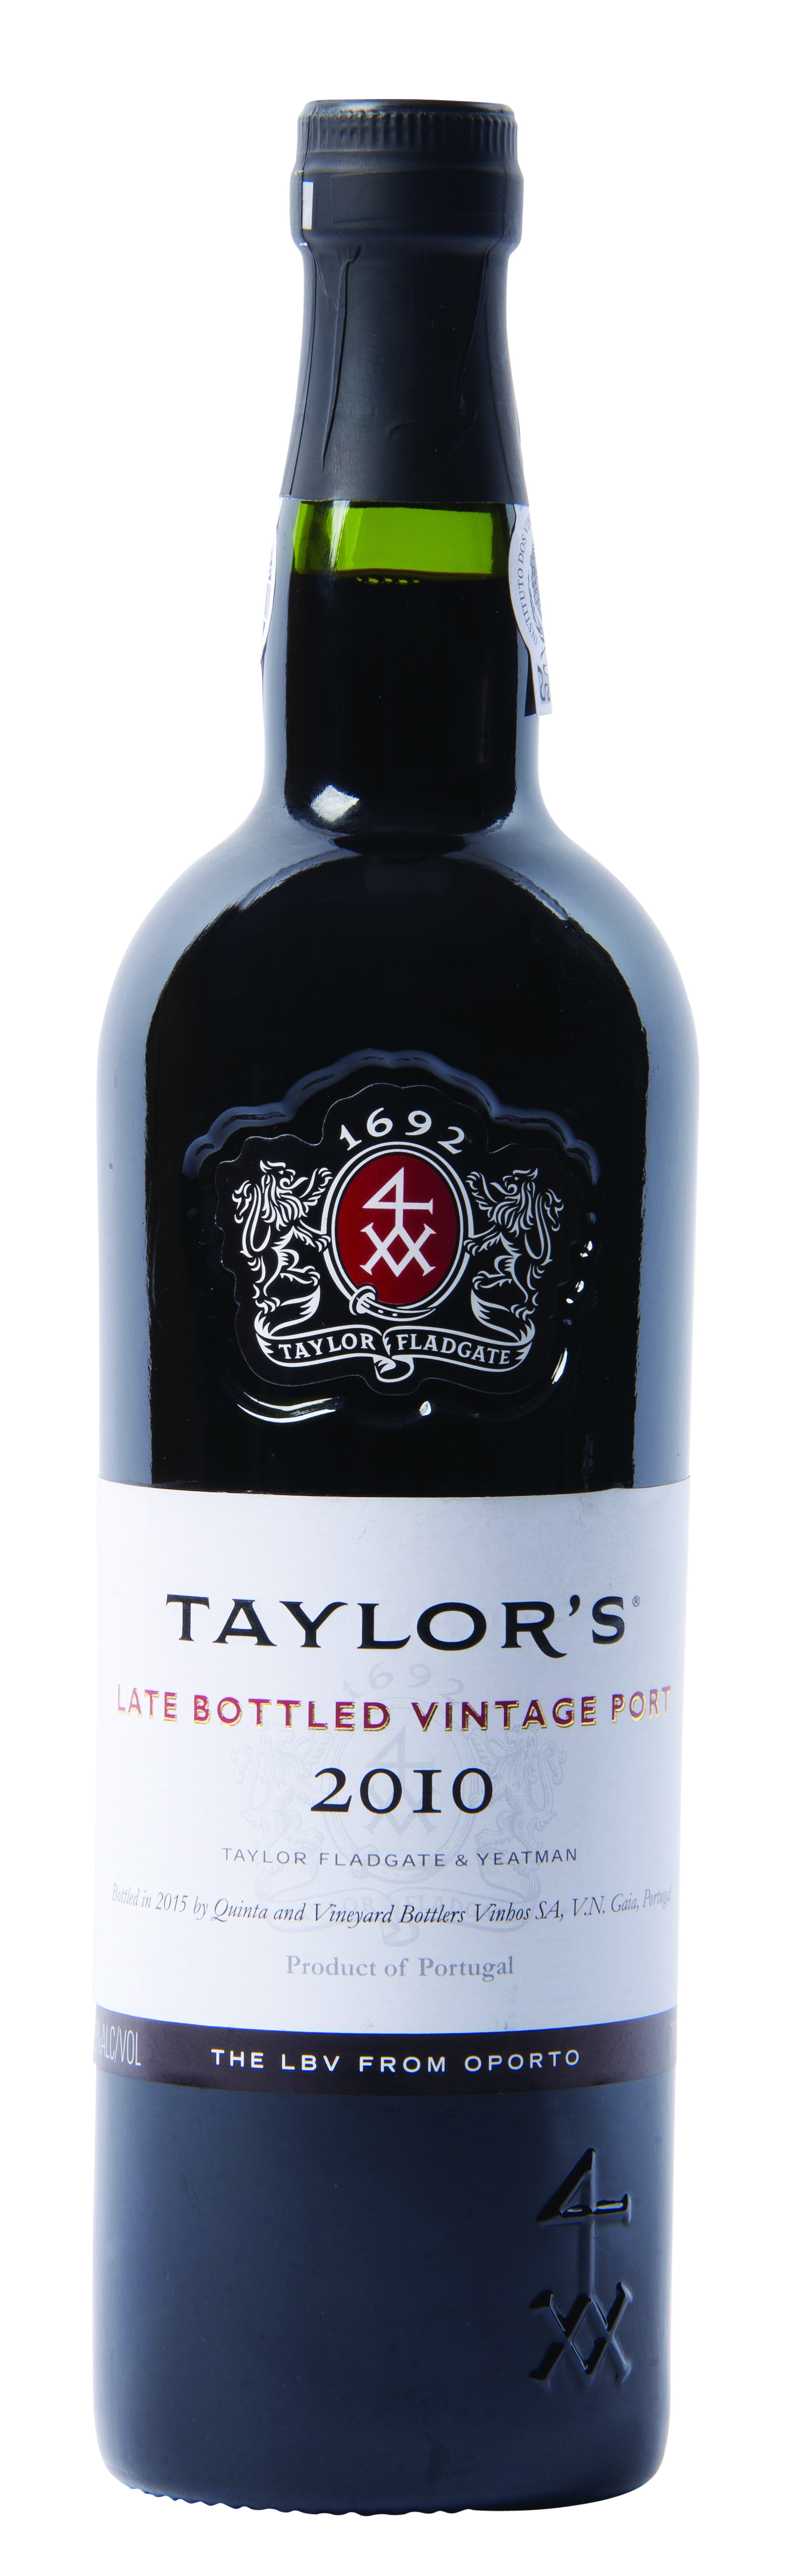 Taylors LBV Port 75cl